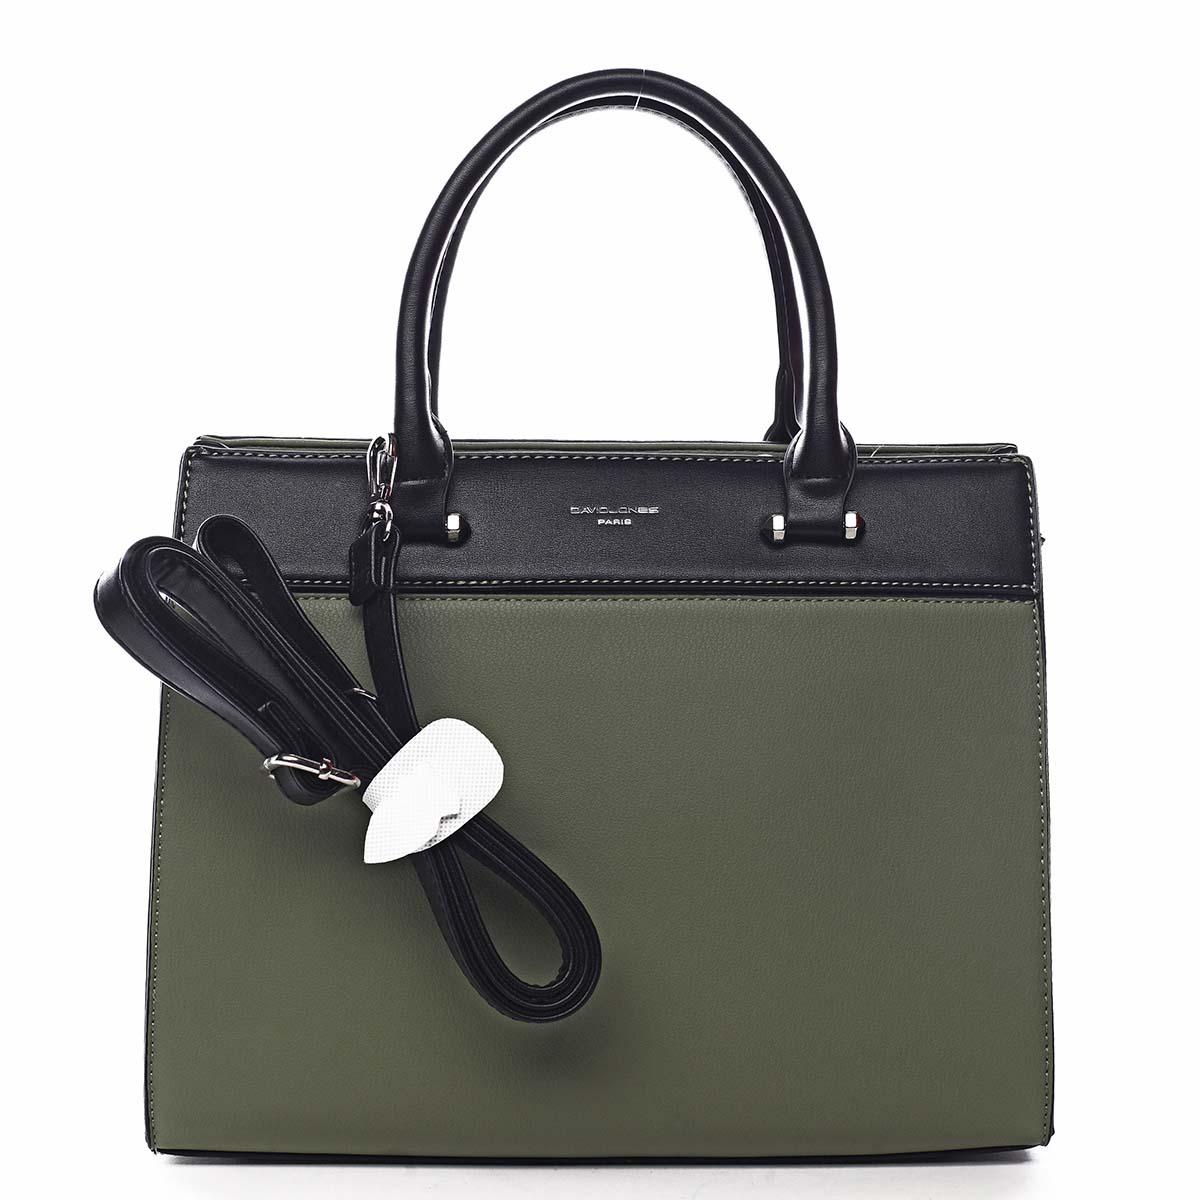 Dámská kabelka do ruky zelená - David Jones Tenerwa